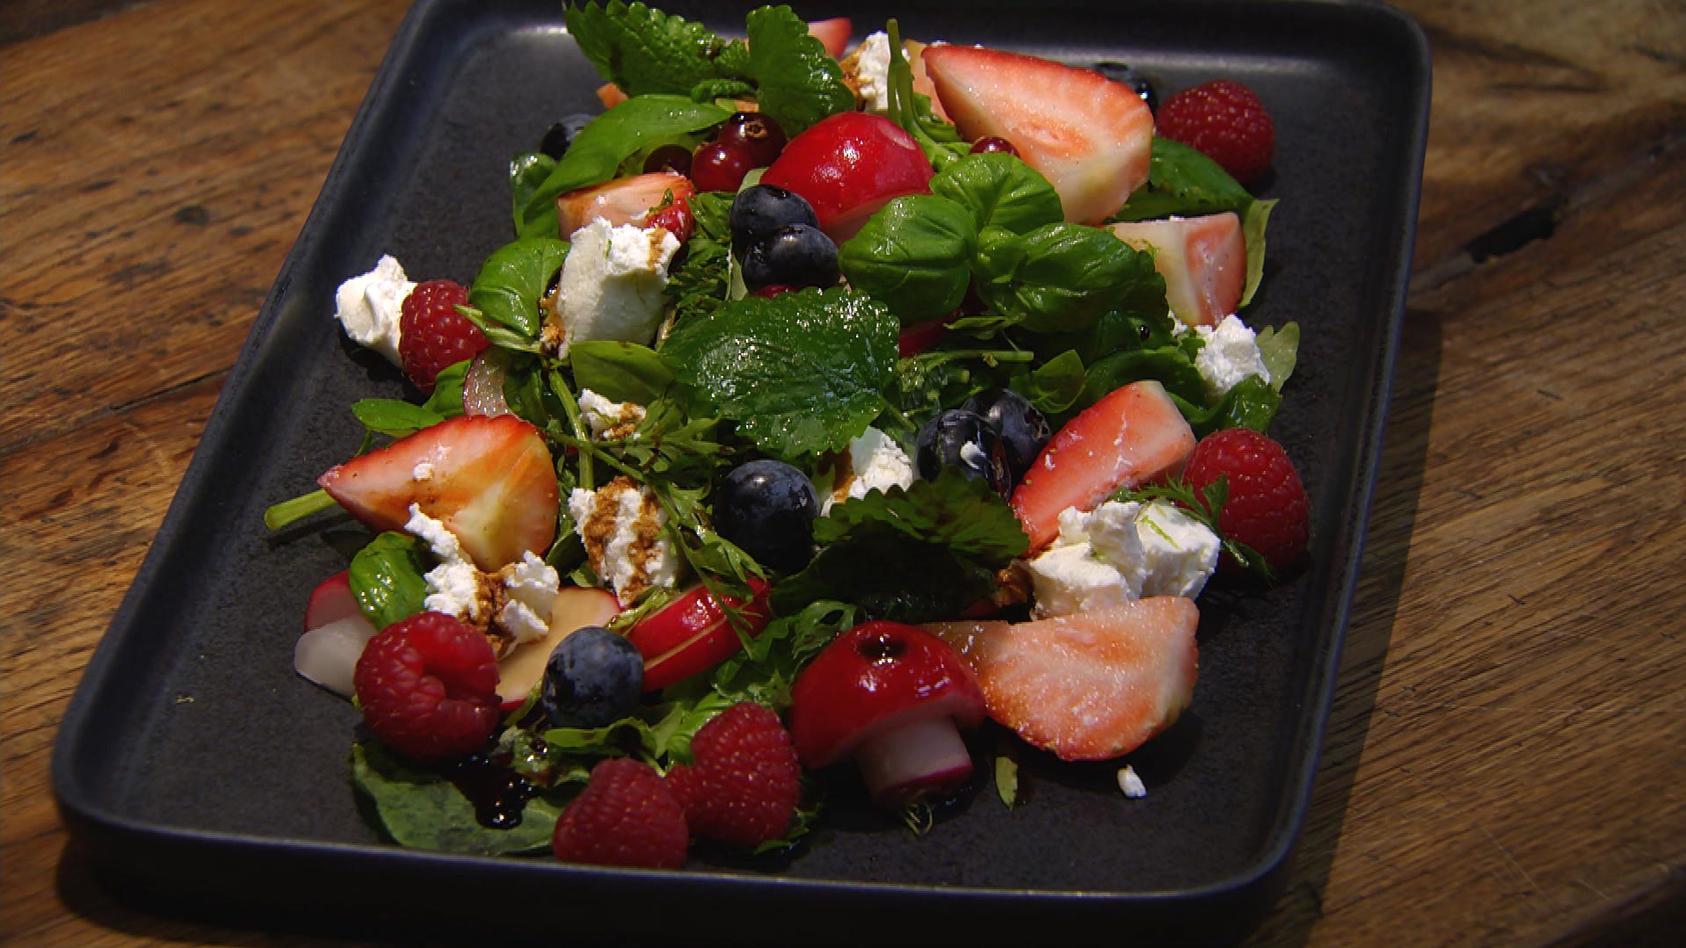 Querbeet – Schätze aus dem Garten: Beeren-Kräuter-Salat mit Ziegenfrischkäse